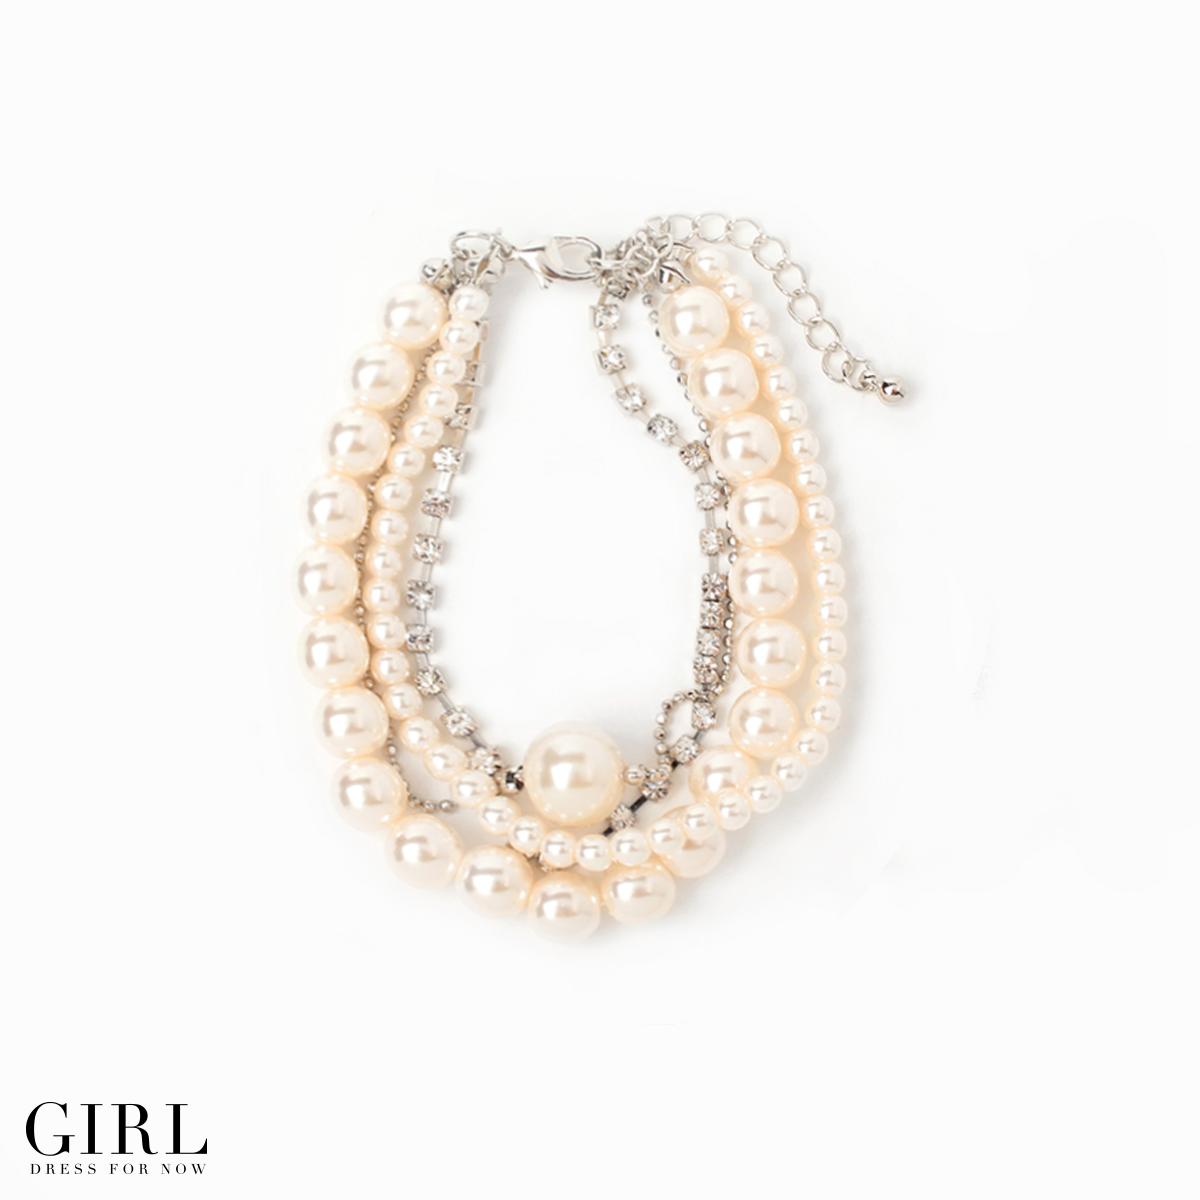 Dress Shop Girl 4 Small Pearl Rhinestone Chain Bracelets